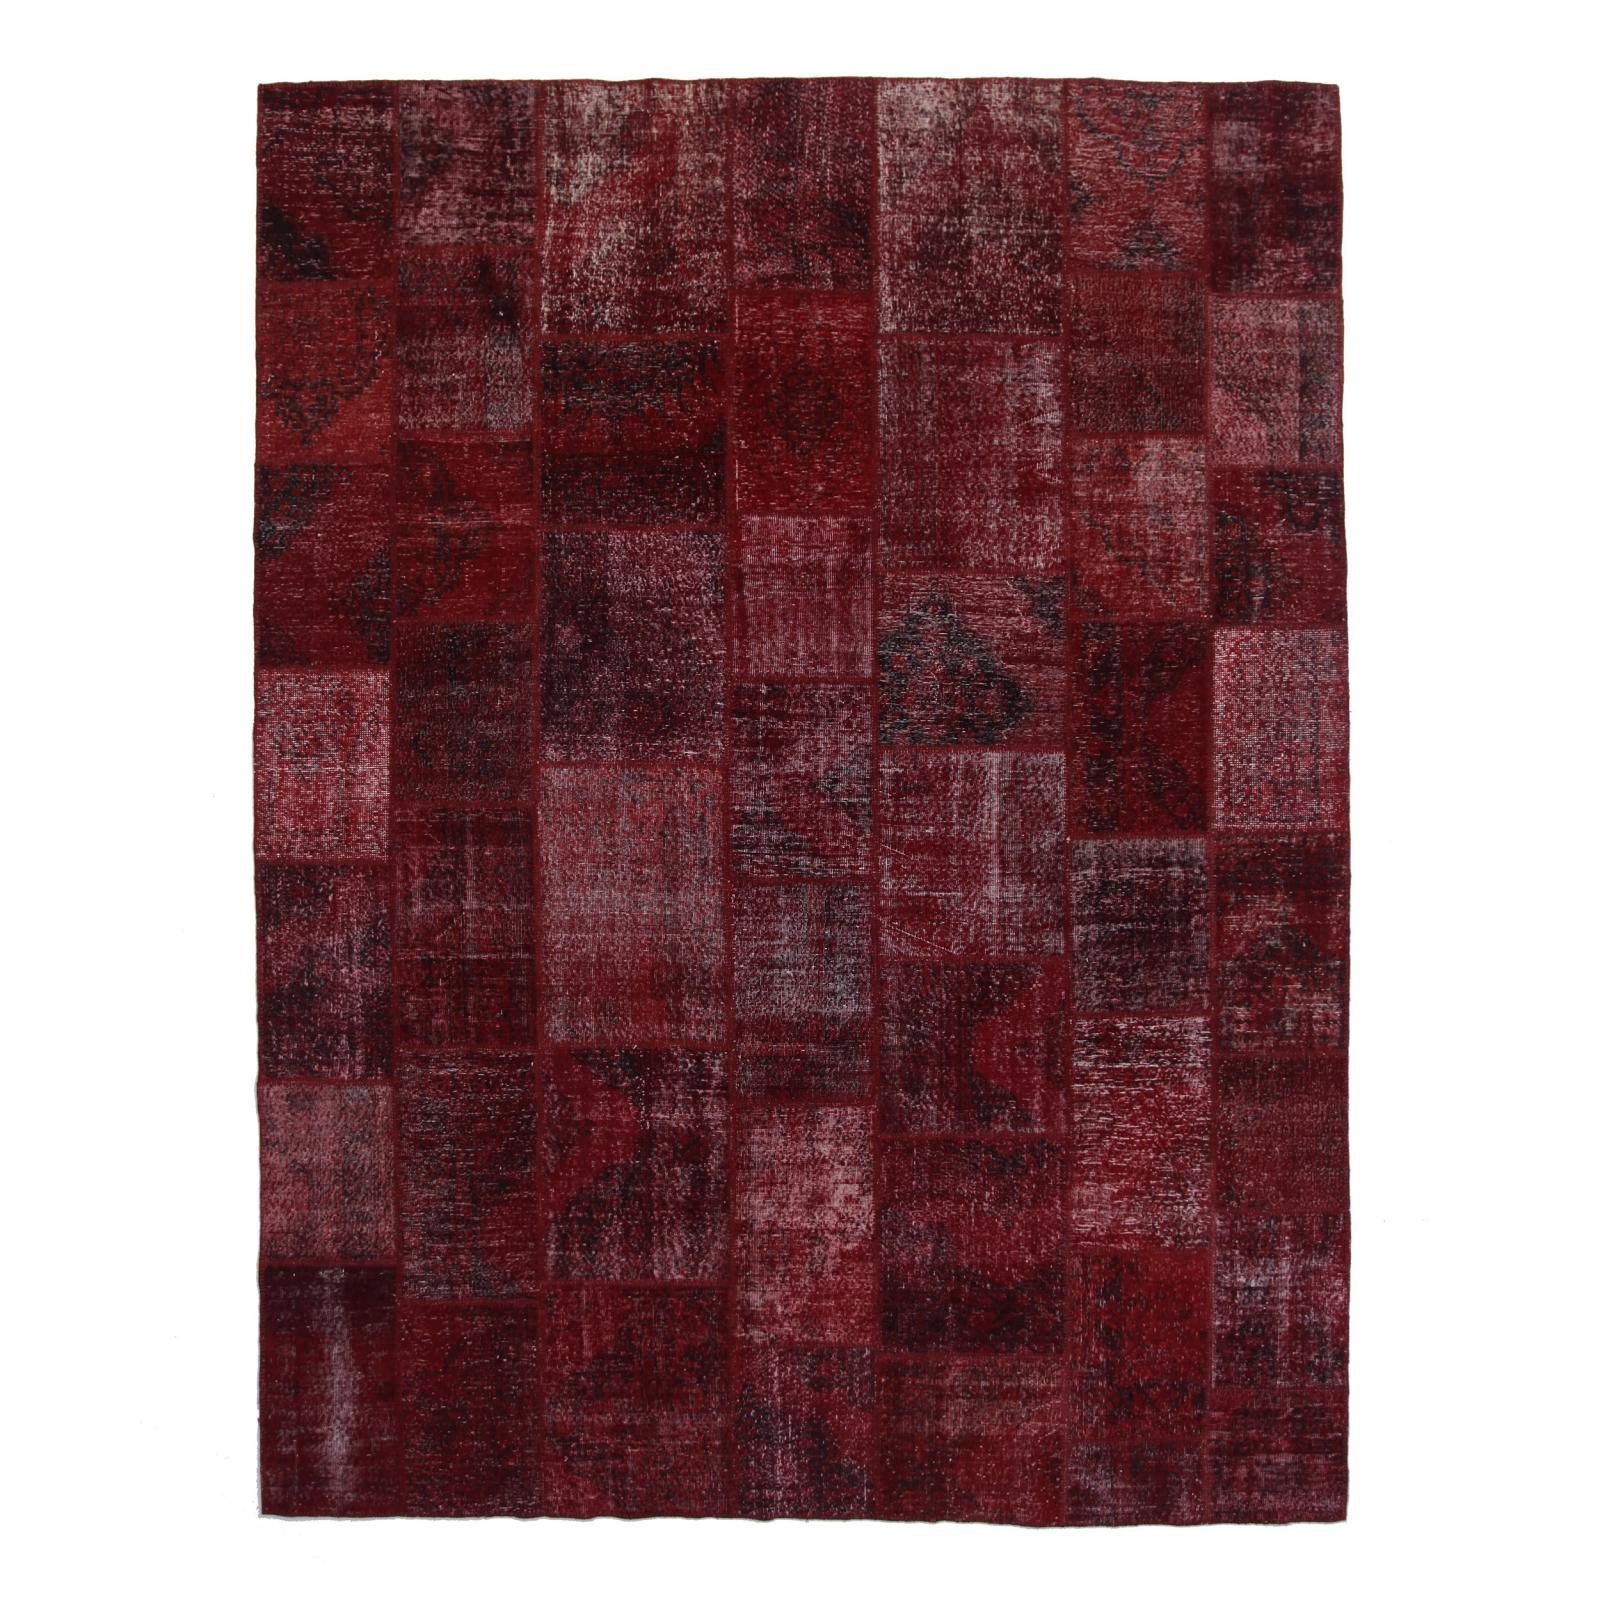 bordeaux rot vintage patchwork flicken teppich 304x406cm. Black Bedroom Furniture Sets. Home Design Ideas